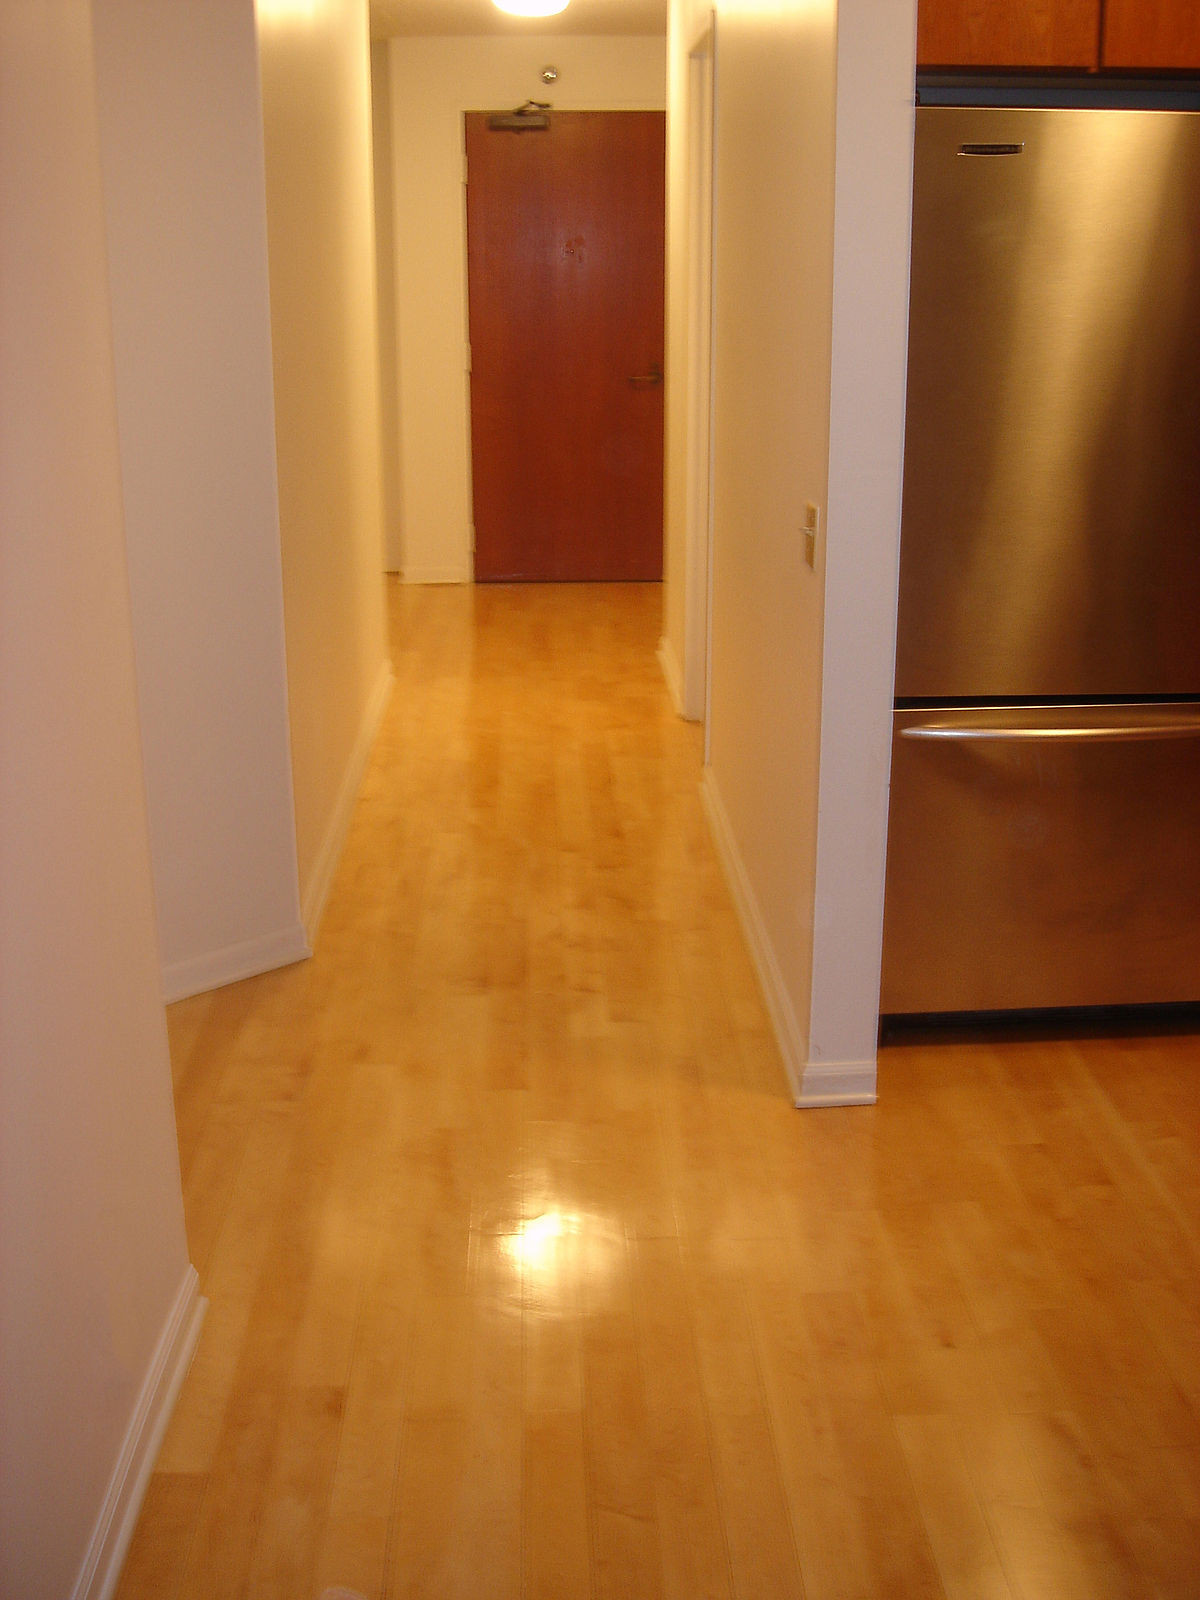 the cheapest hardwood flooring of hardwood flooring deals ontario flooring ideas throughout full size of bedroom delightful hardwood flooring 8 1200px